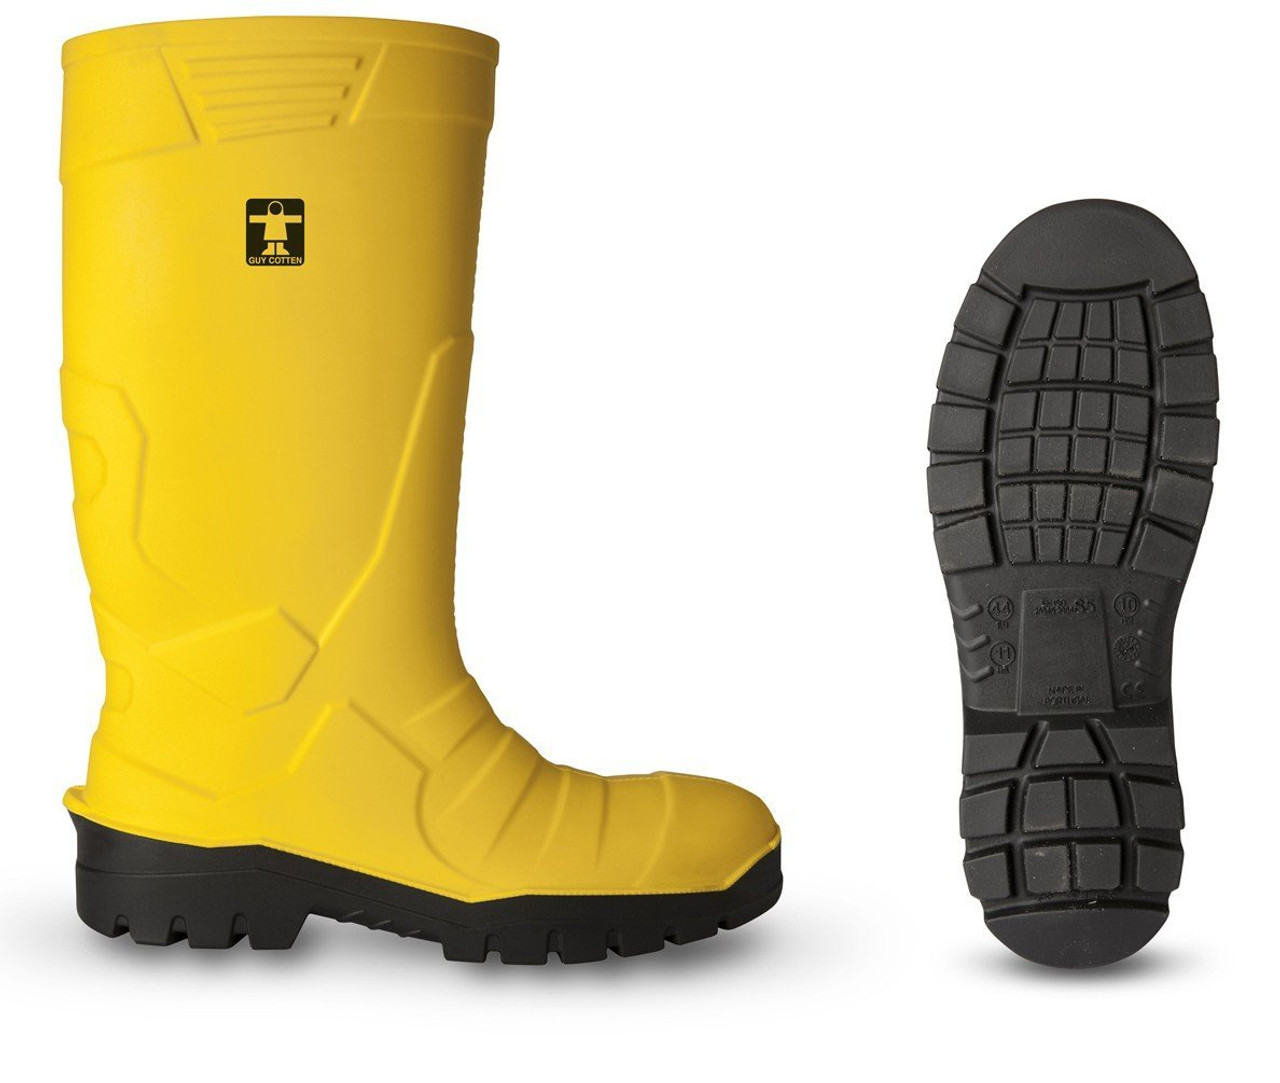 e6531027cc0 Guy Cotten GC Safety Boots